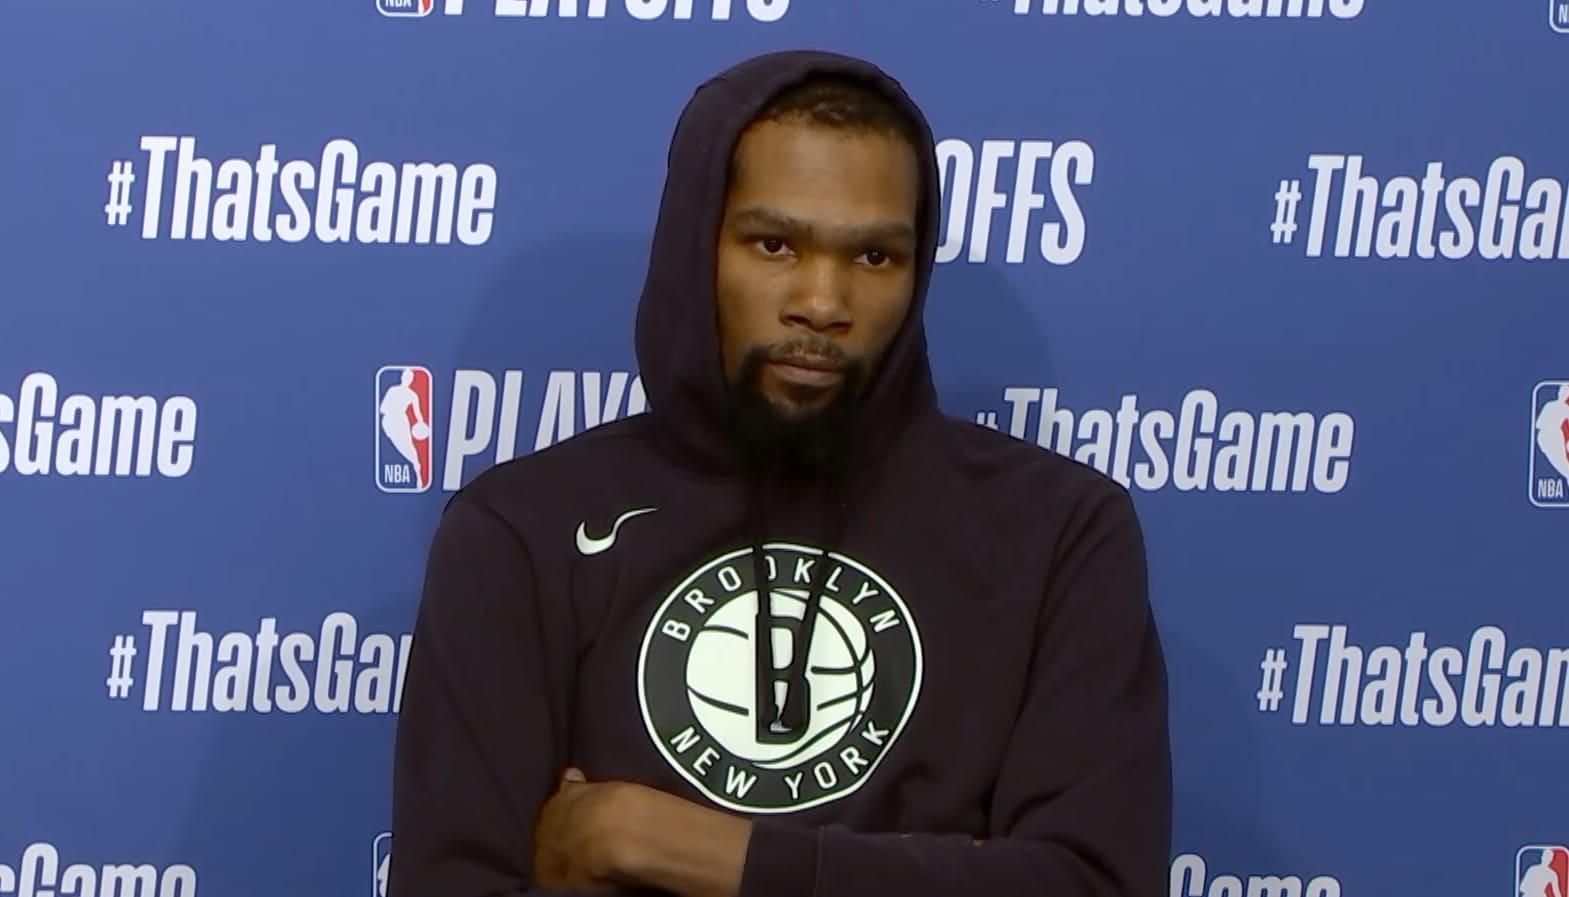 Kevin Durant praises Bucks after tough Game 7 loss